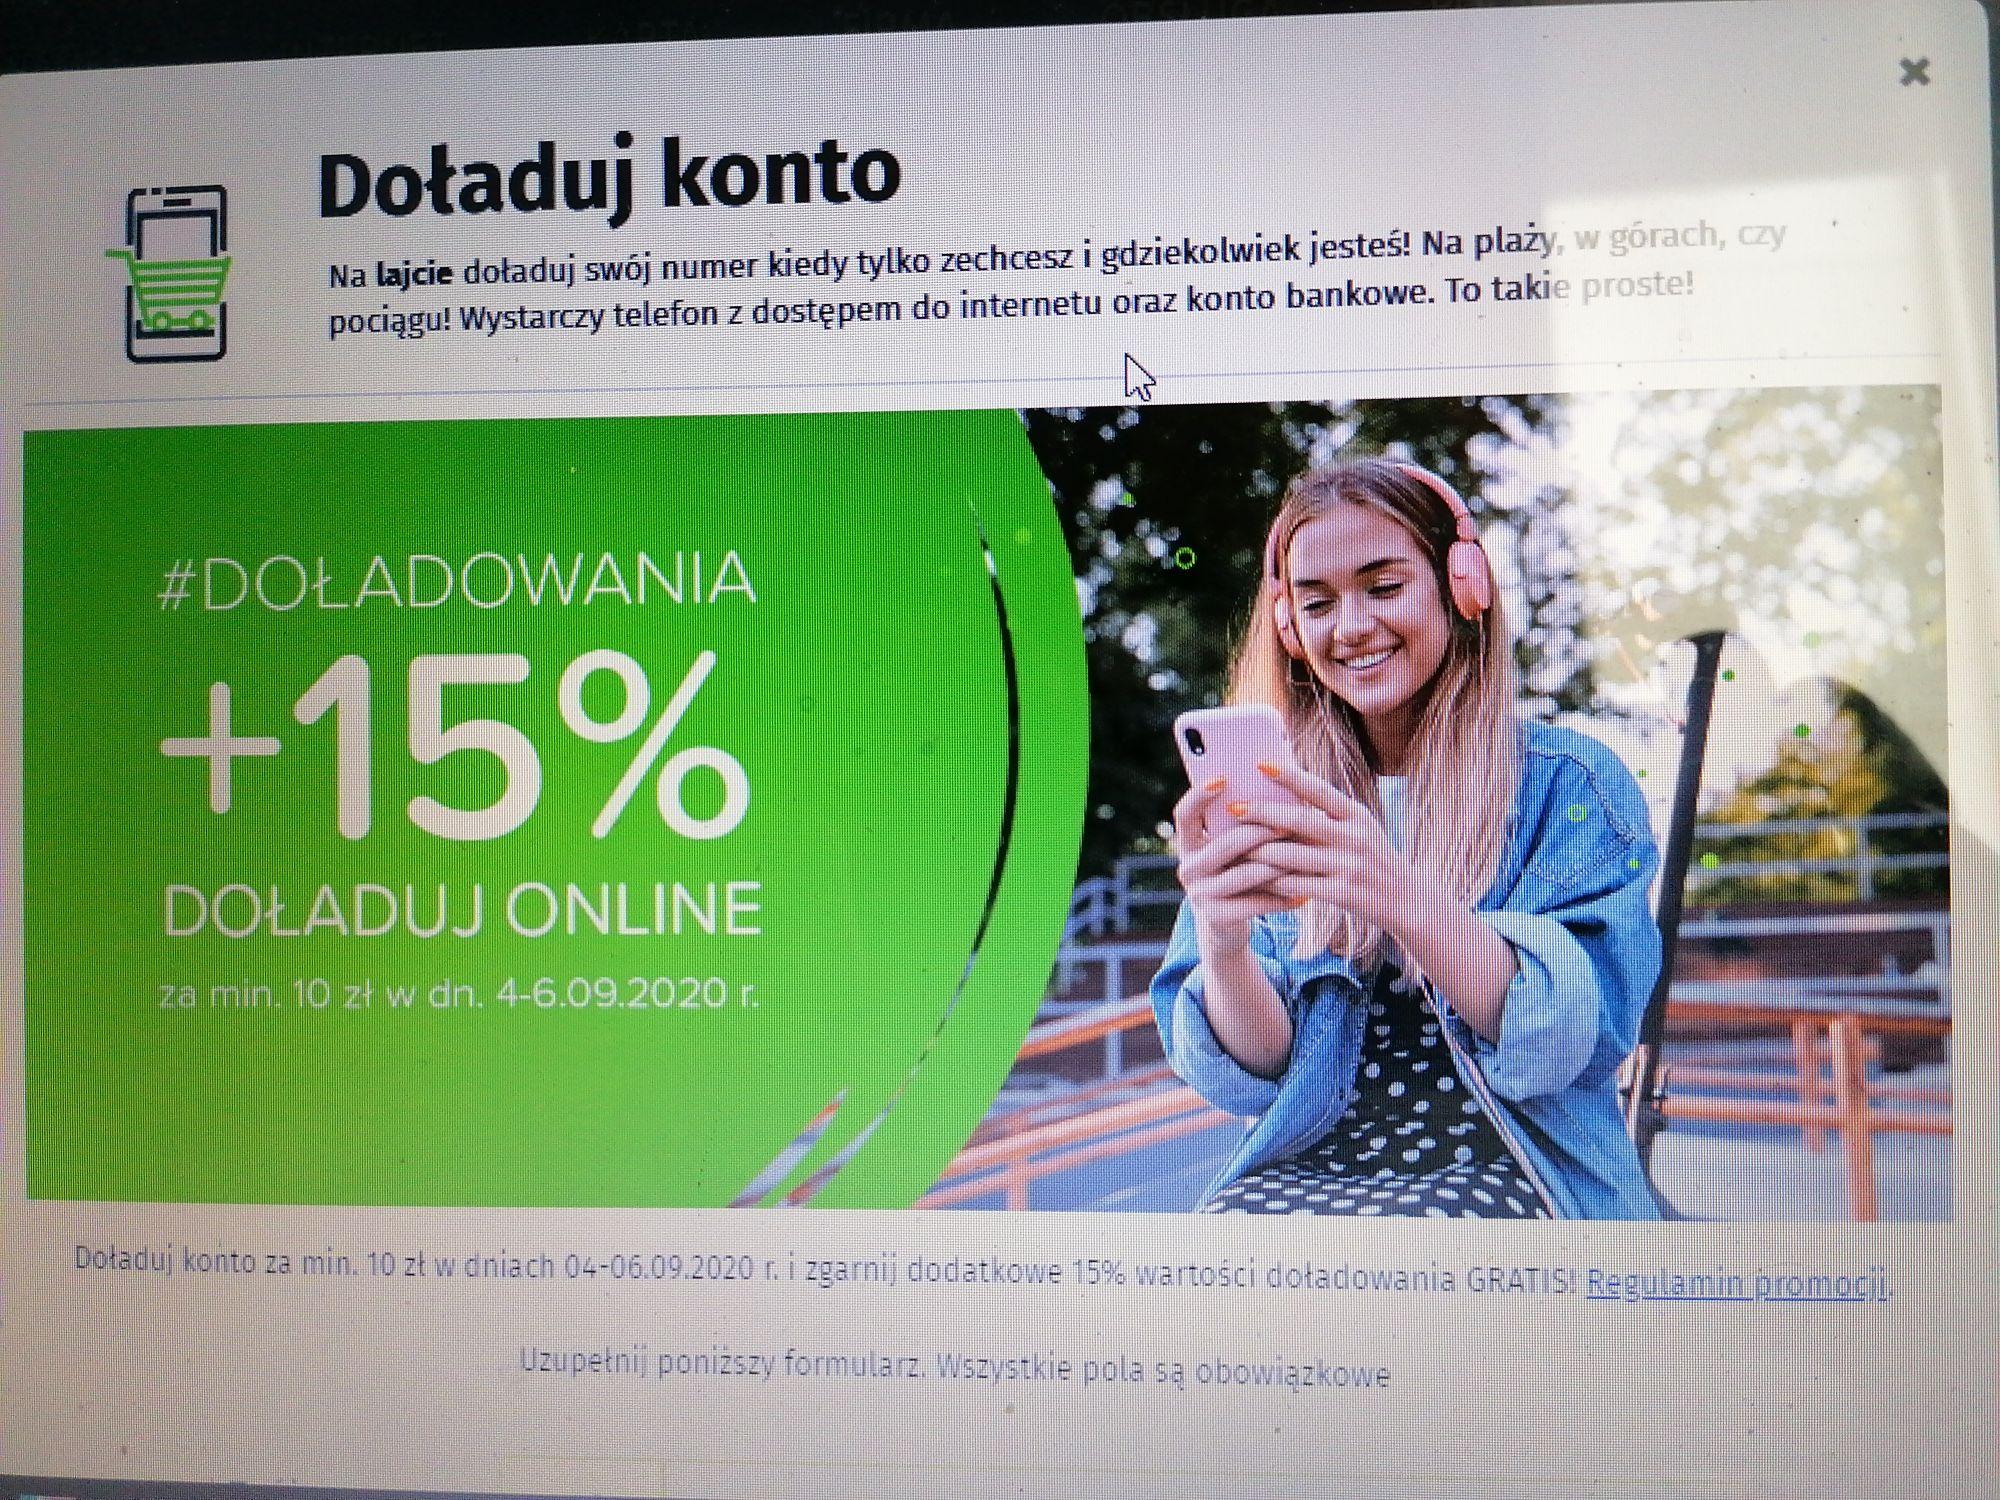 Lajt mobile 15% extra